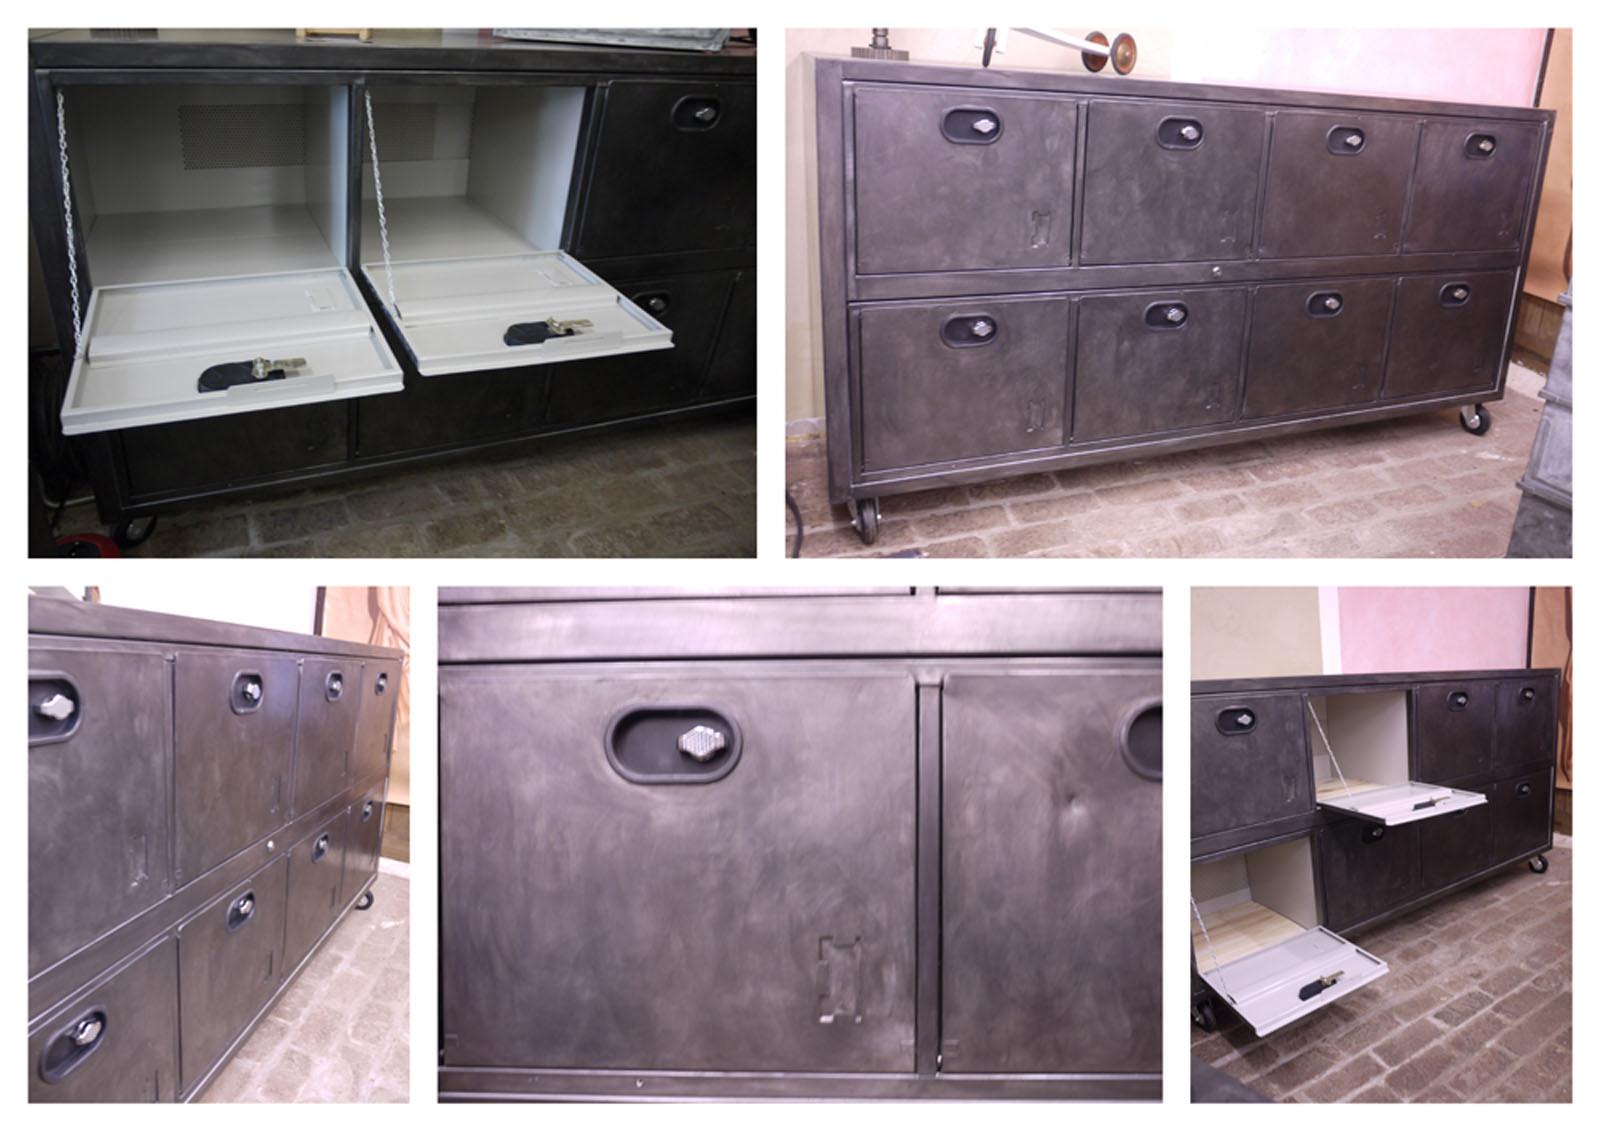 buffet metallique cr ation design industriel dans buffet buffet 8 portes 1024x723. Black Bedroom Furniture Sets. Home Design Ideas